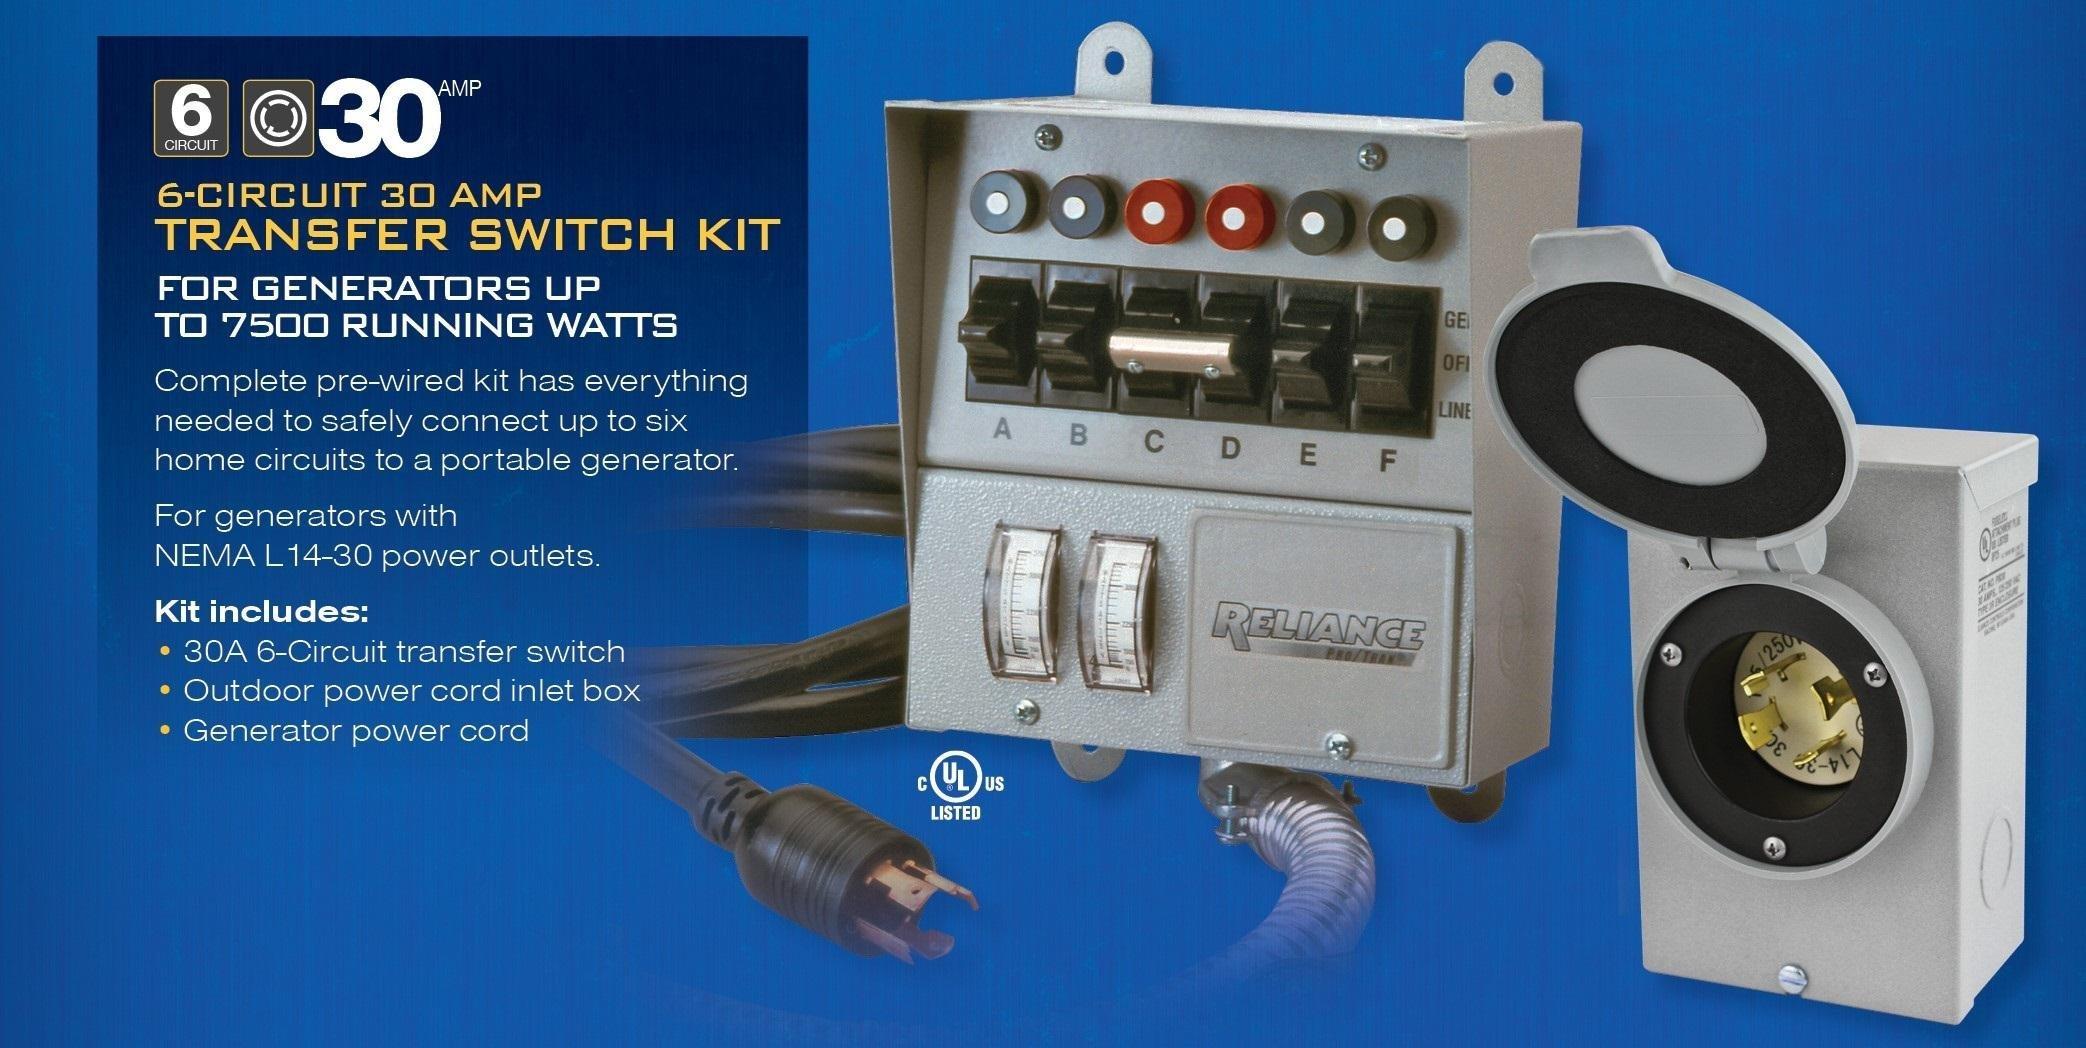 Reliance Protran Transfer Switch Wiring Diagram